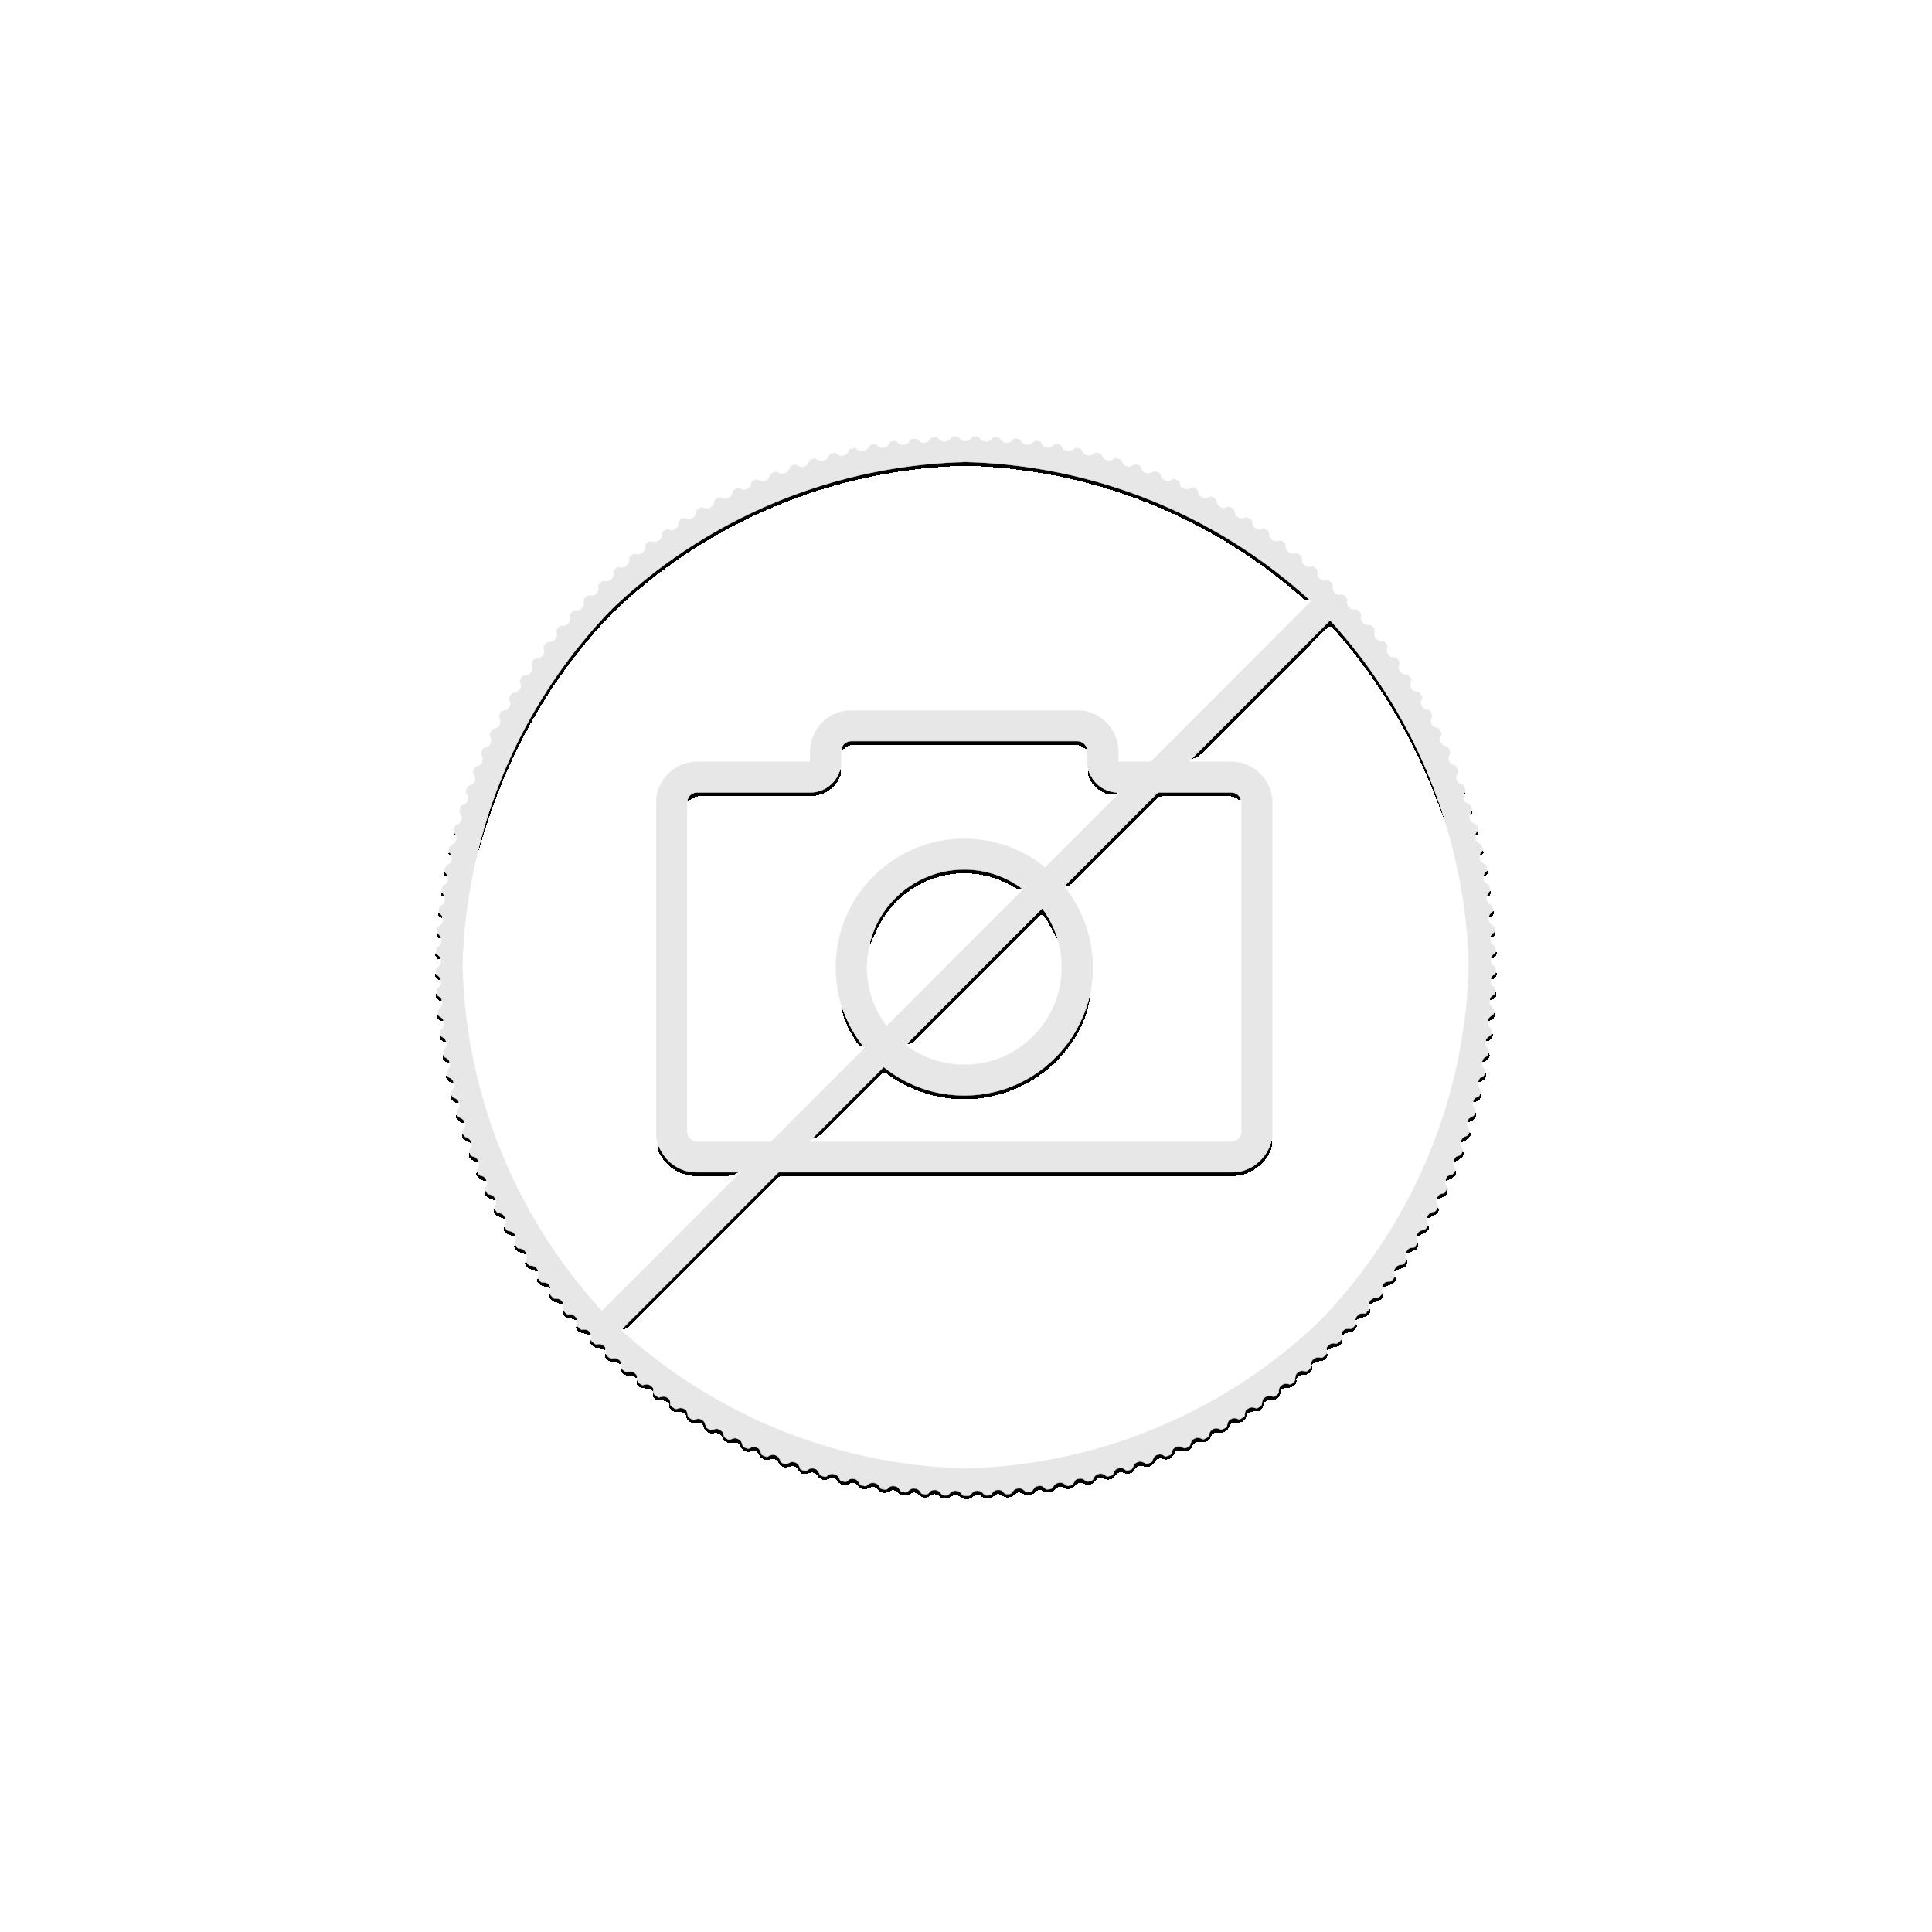 1 Troy ounce platinum coin Britannia